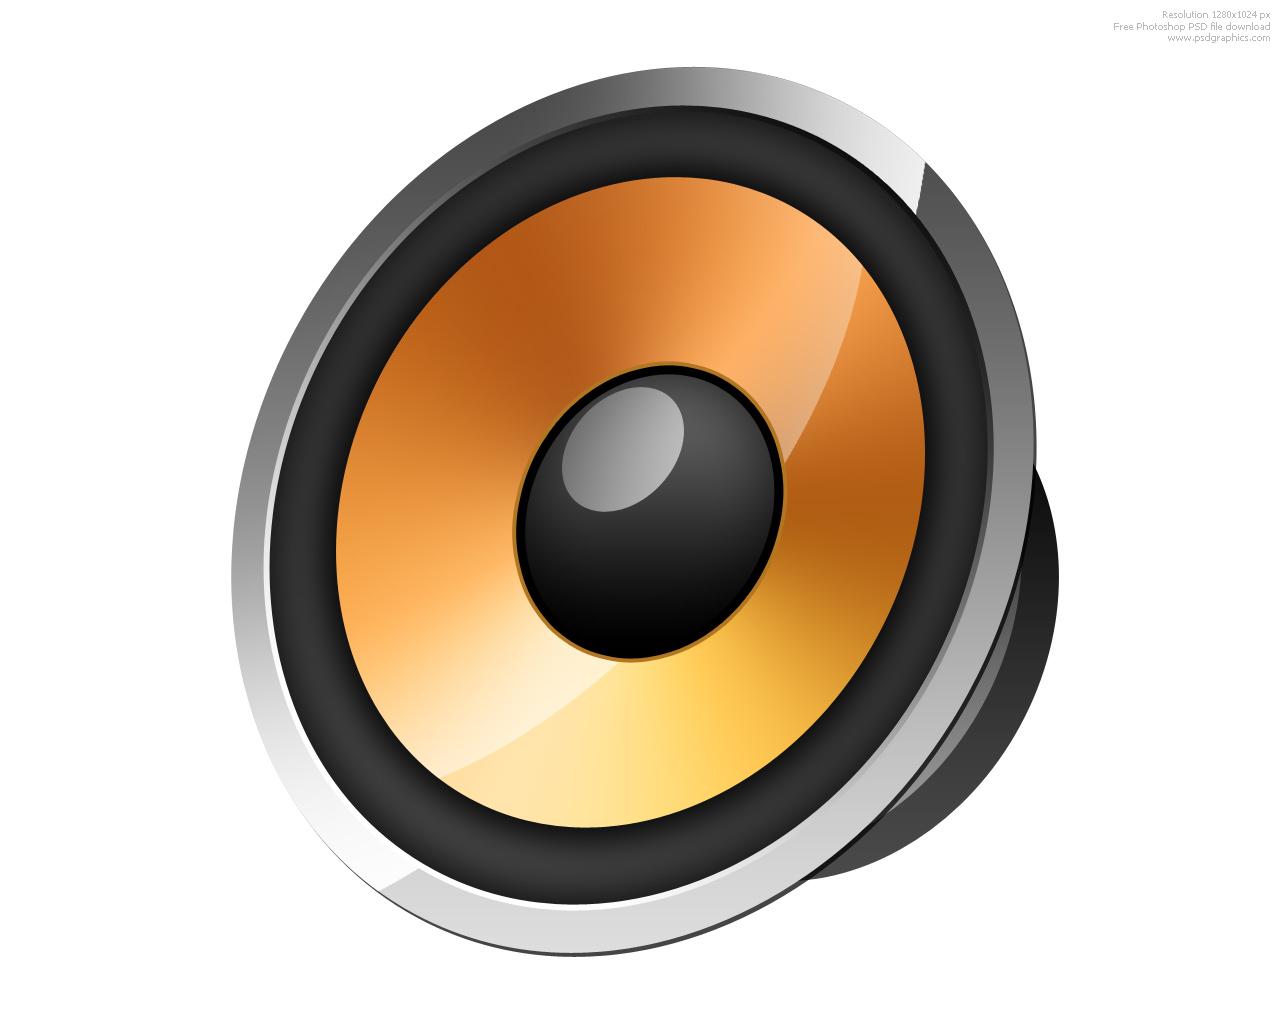 download vectors icon free speaker png transparent background free download 29725 freeiconspng download vectors icon free speaker png